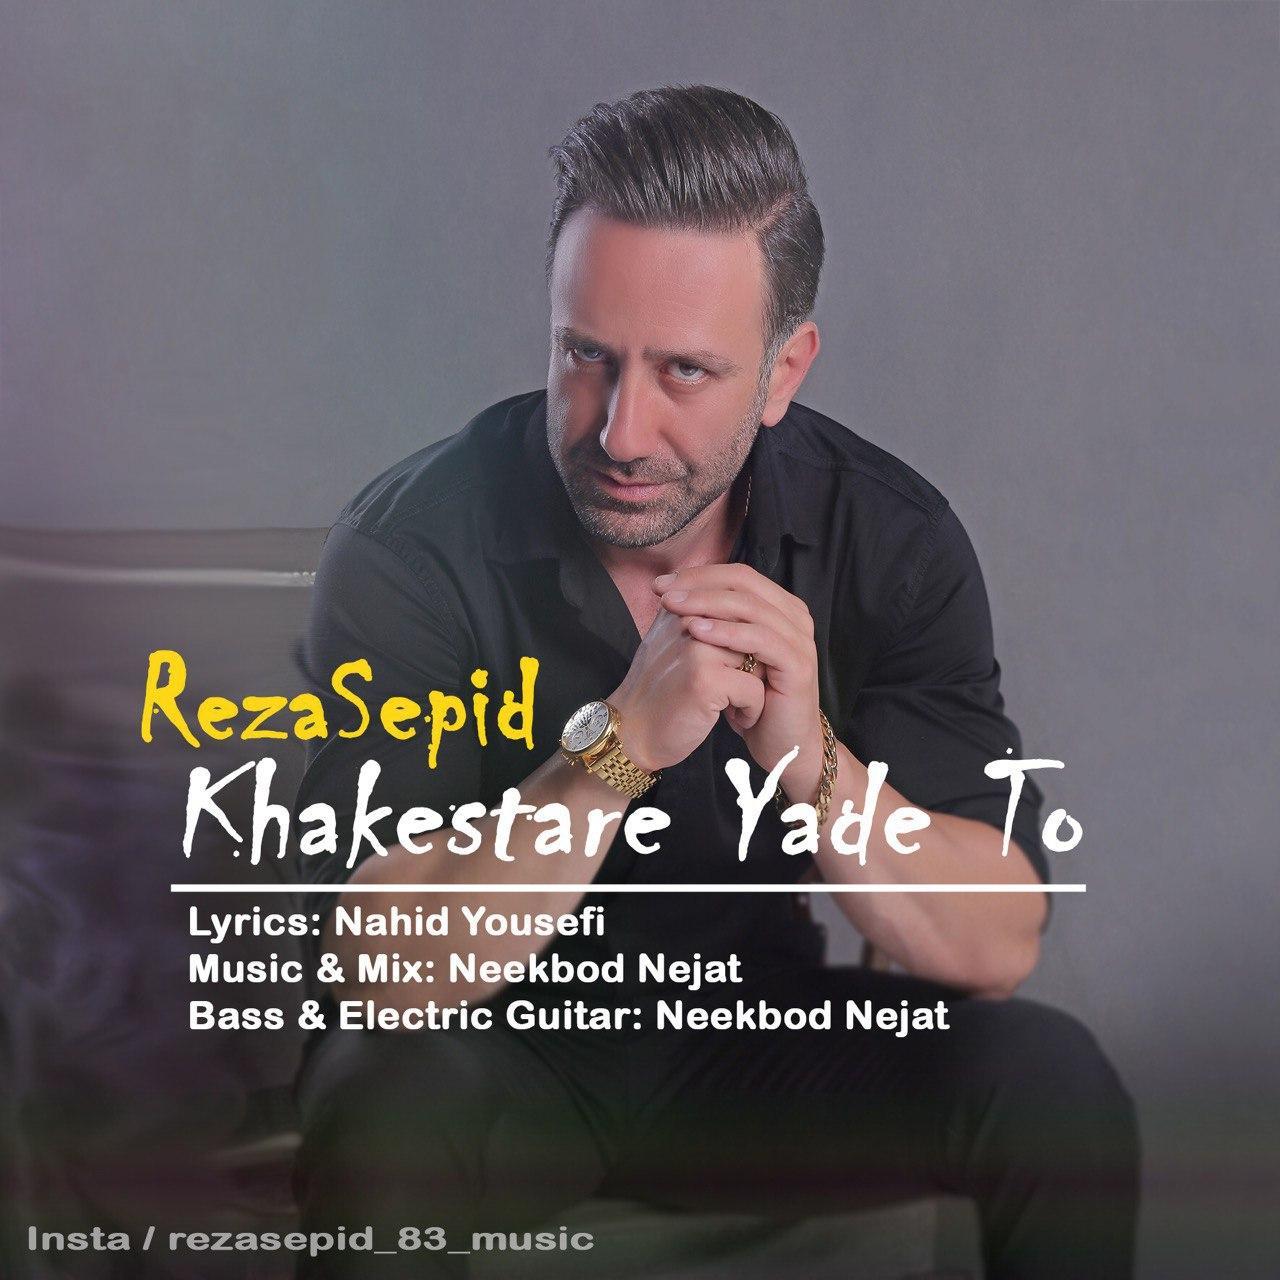 Reza Sepid – Khakestare Yade To